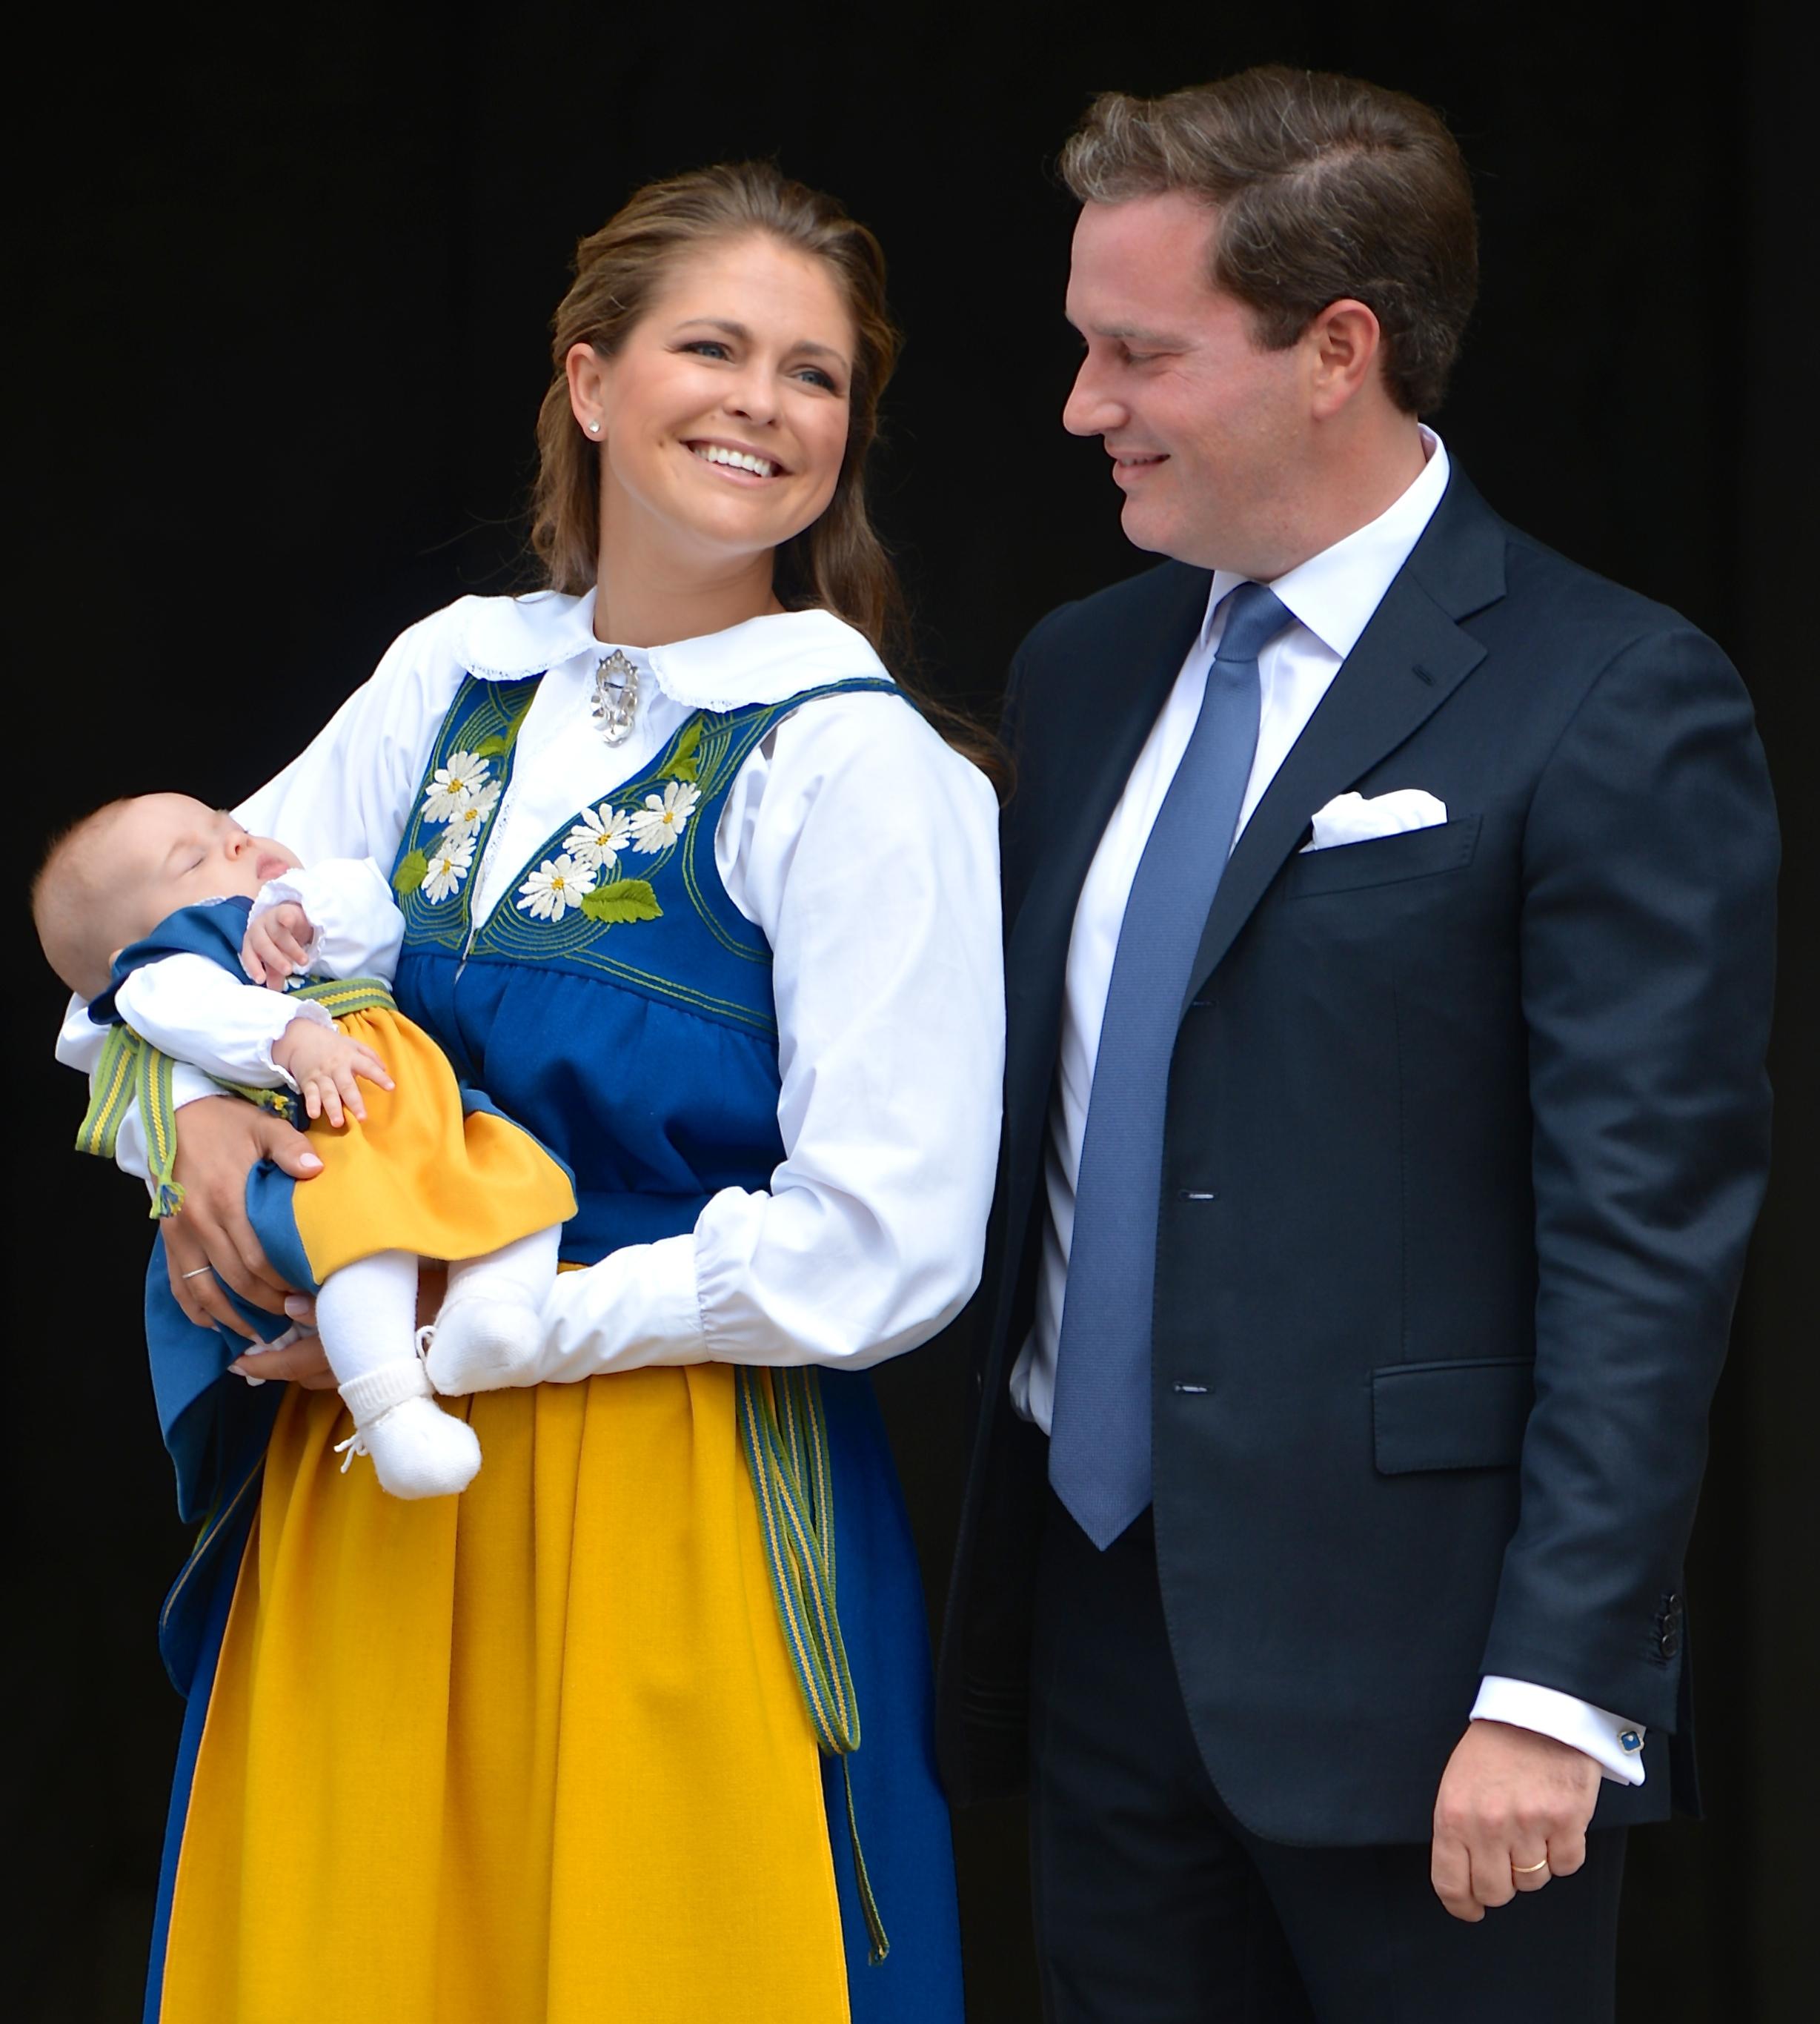 ملفmadeleine Of Sweden Christopher Oneill 6jpg ويكيبيديا